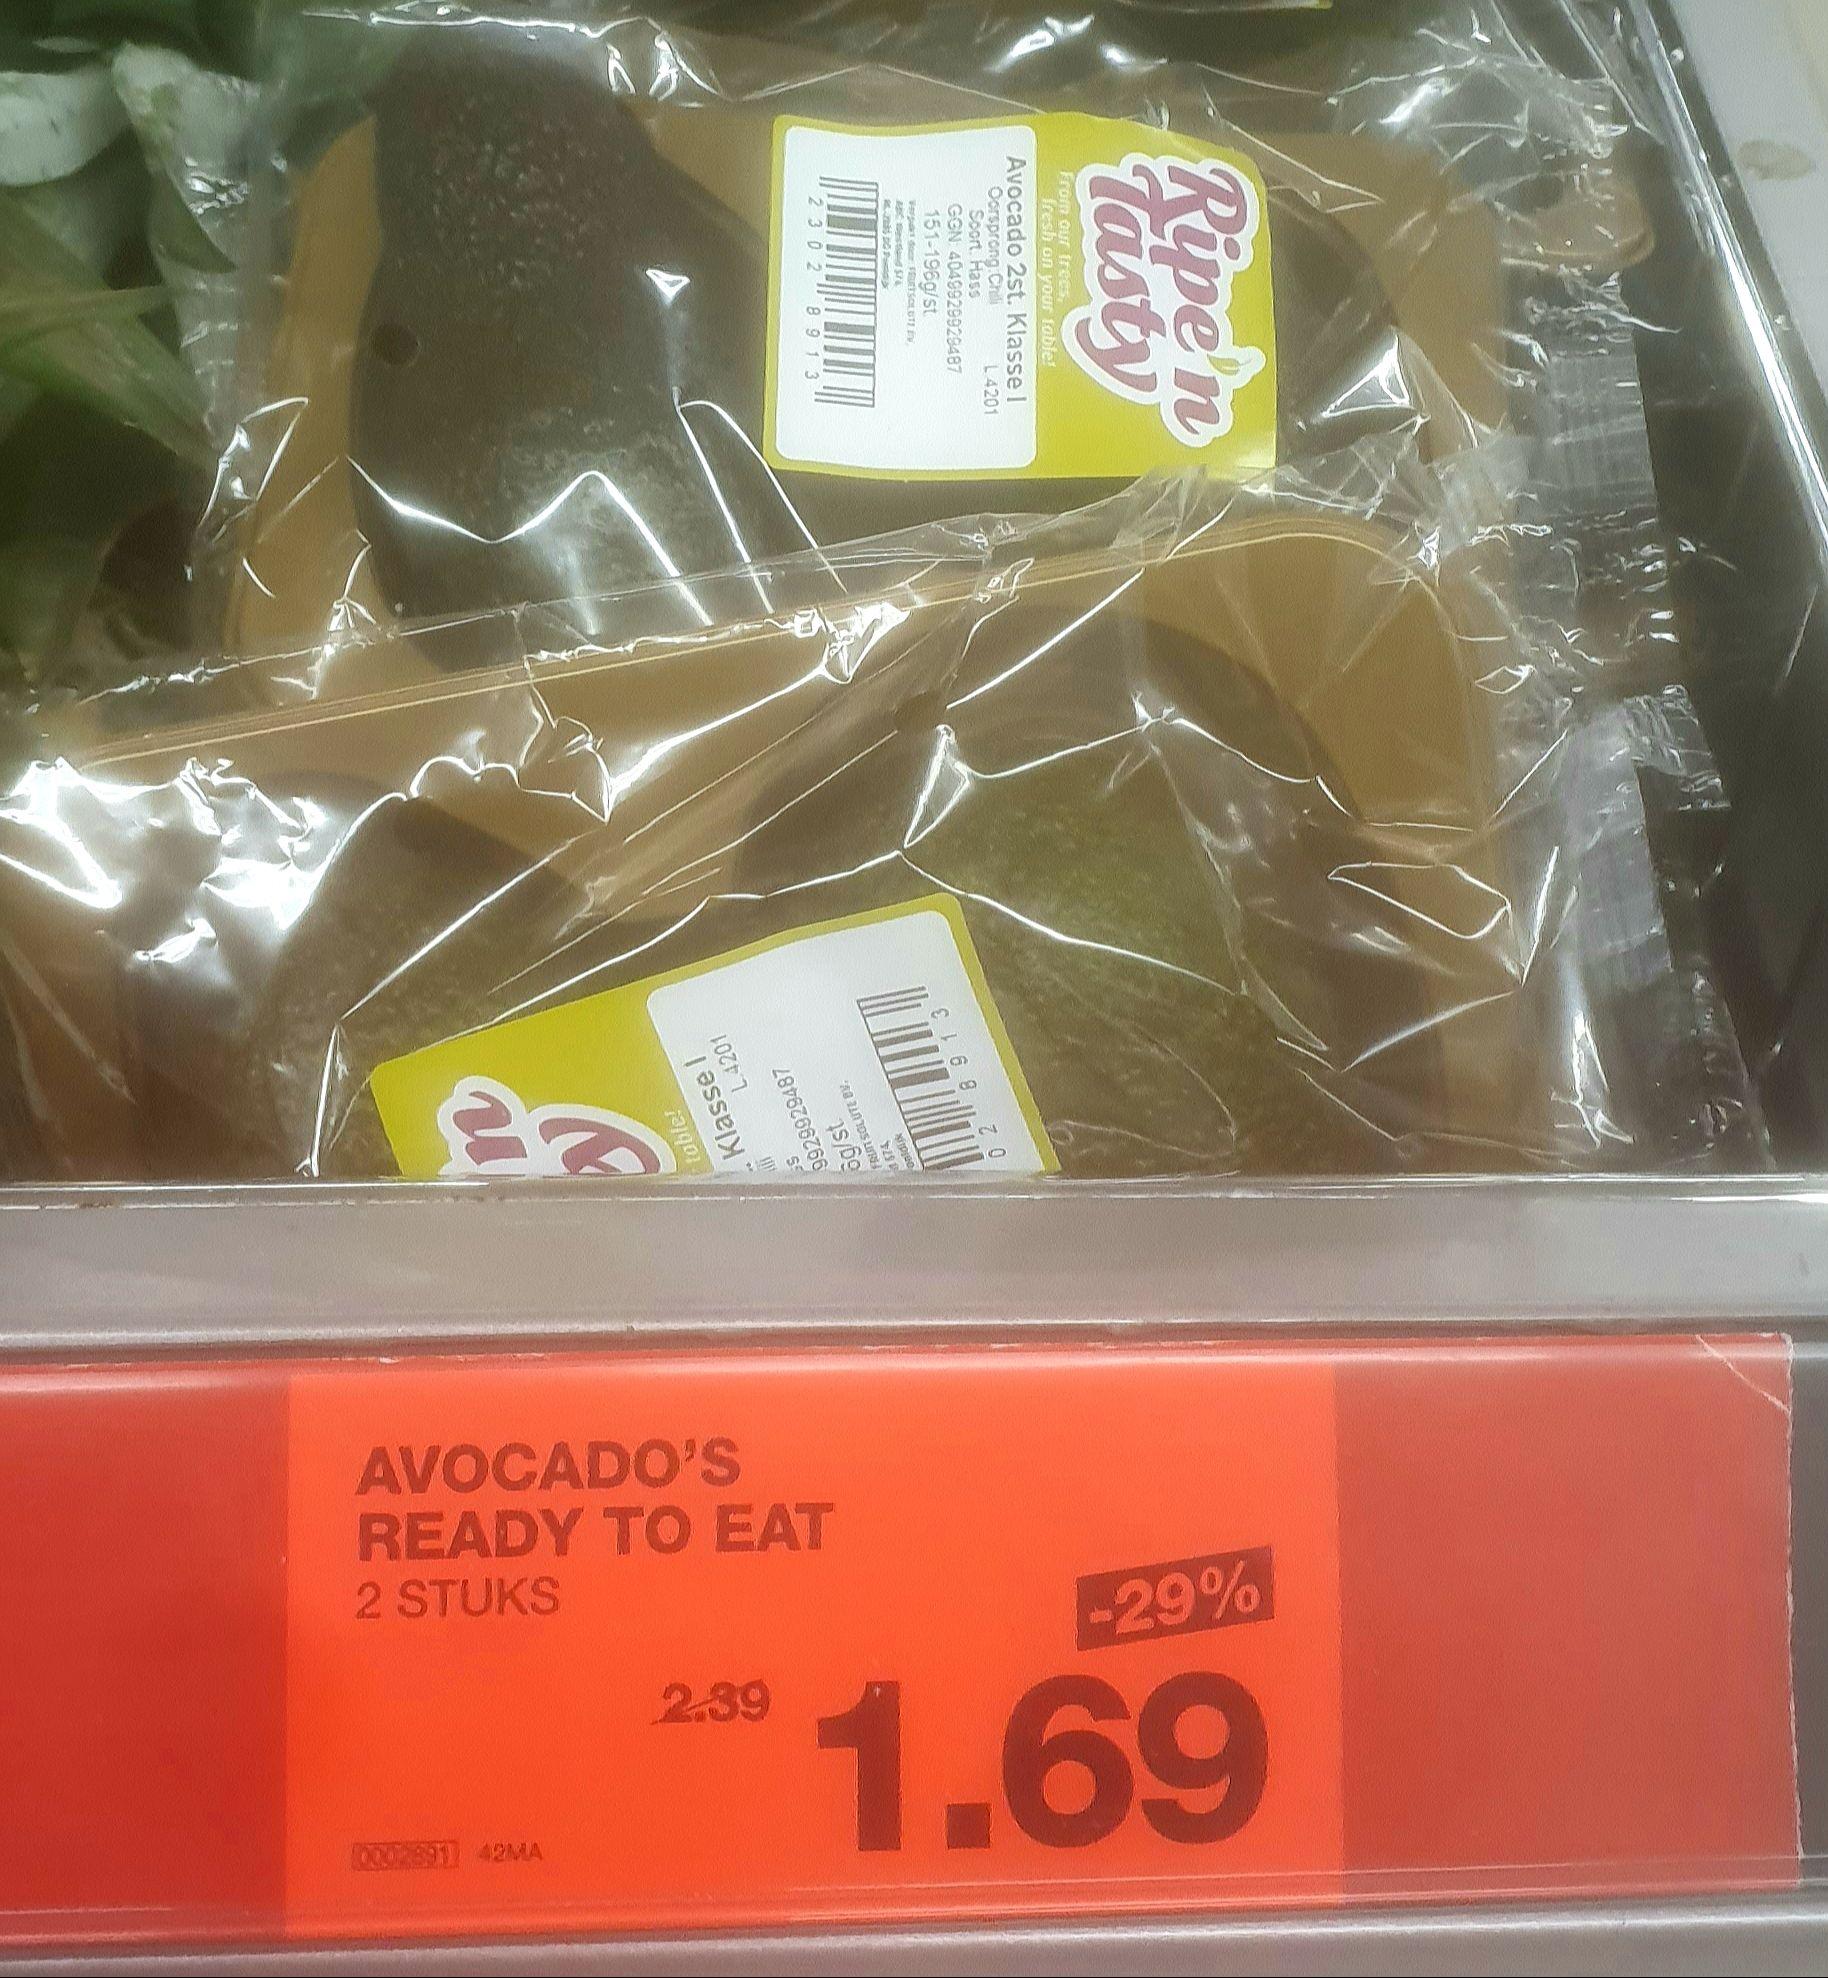 Ready-to-eat Avocado's - 2 stuks